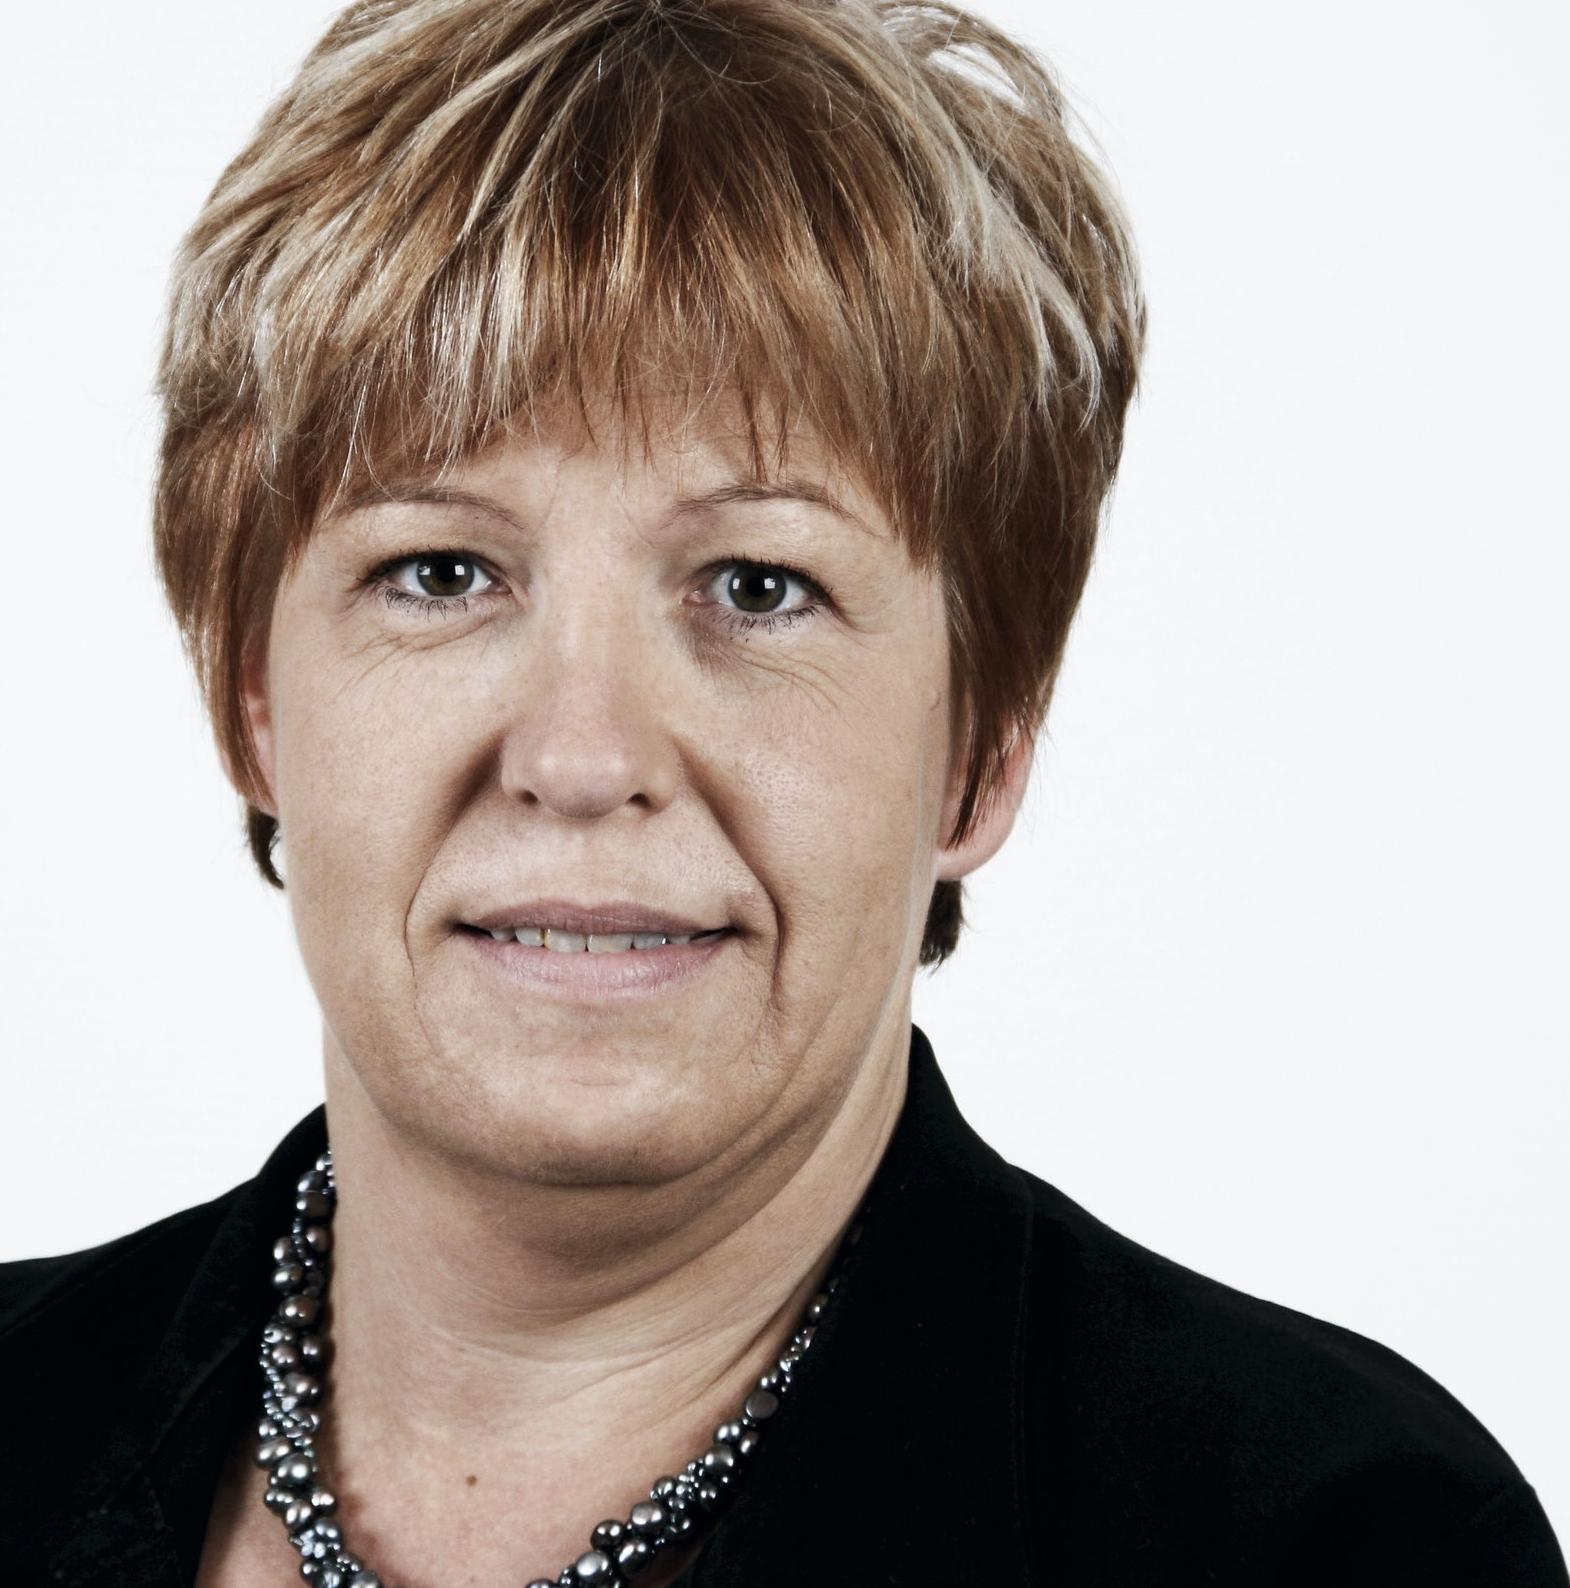 FINANCE Hanne Andersen  Finance Manager  T +45 9661 3704 M +45 2286 8914 ha@ab-inventech.dk